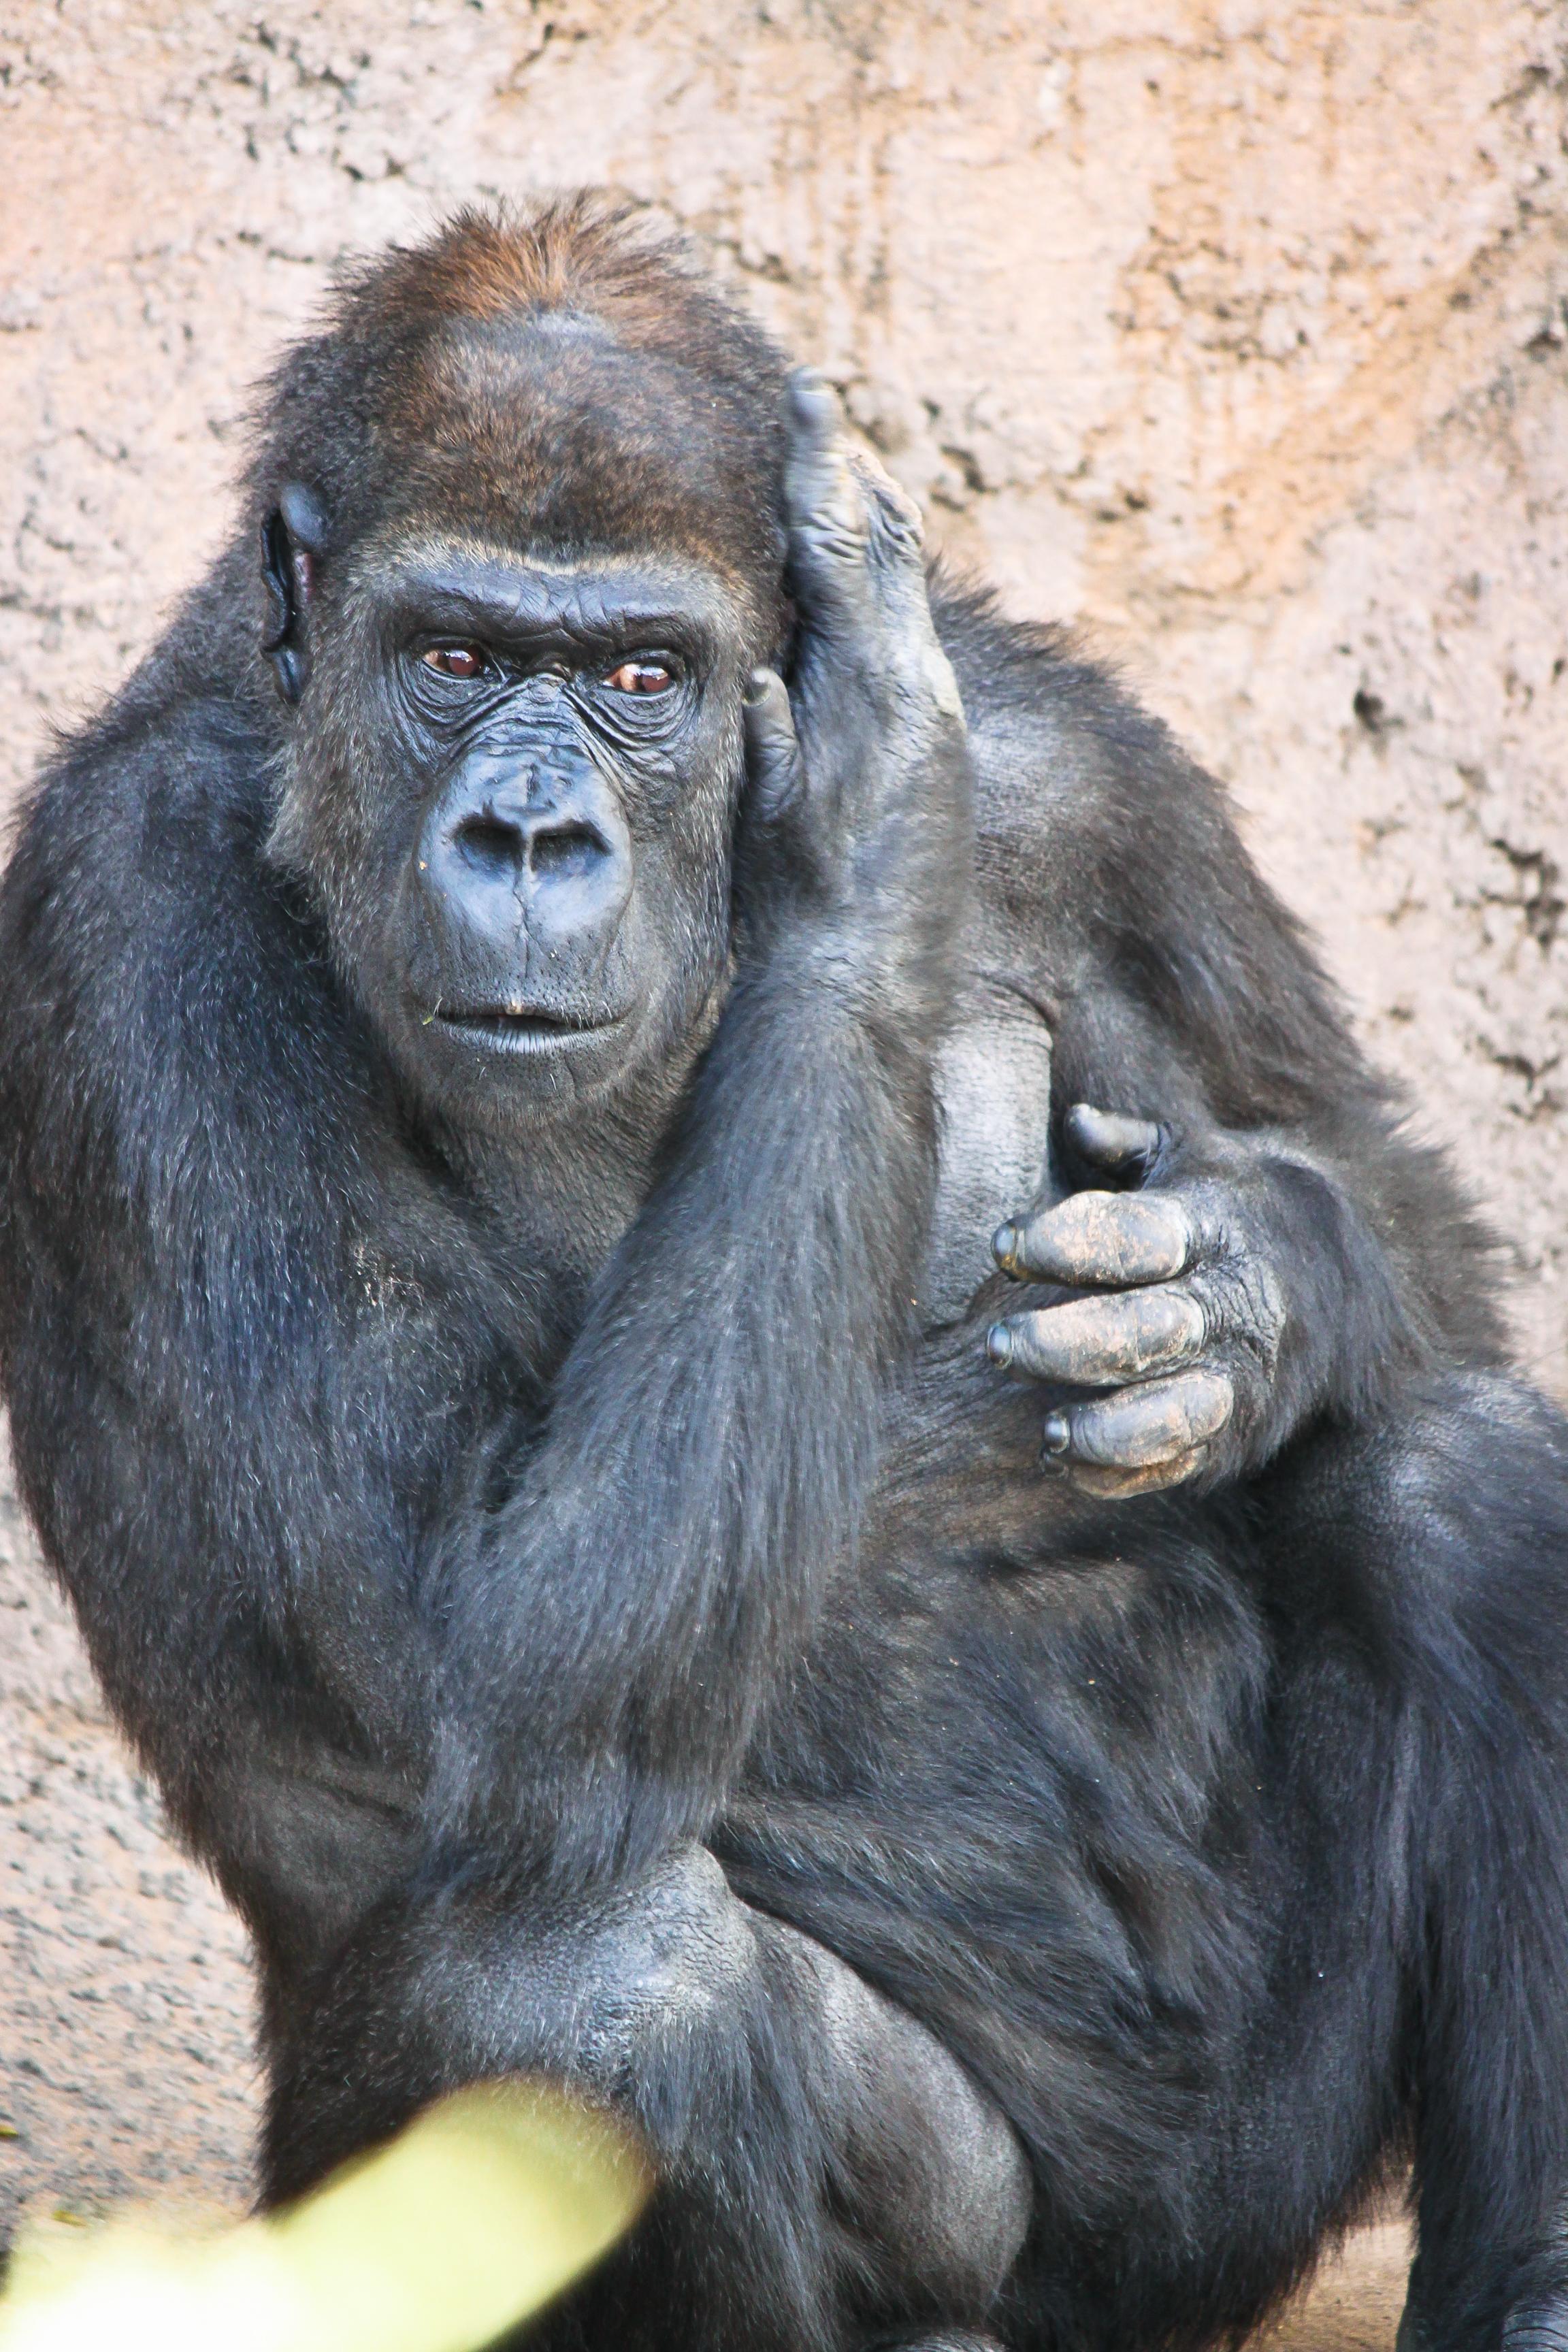 Huerfanita gorilla